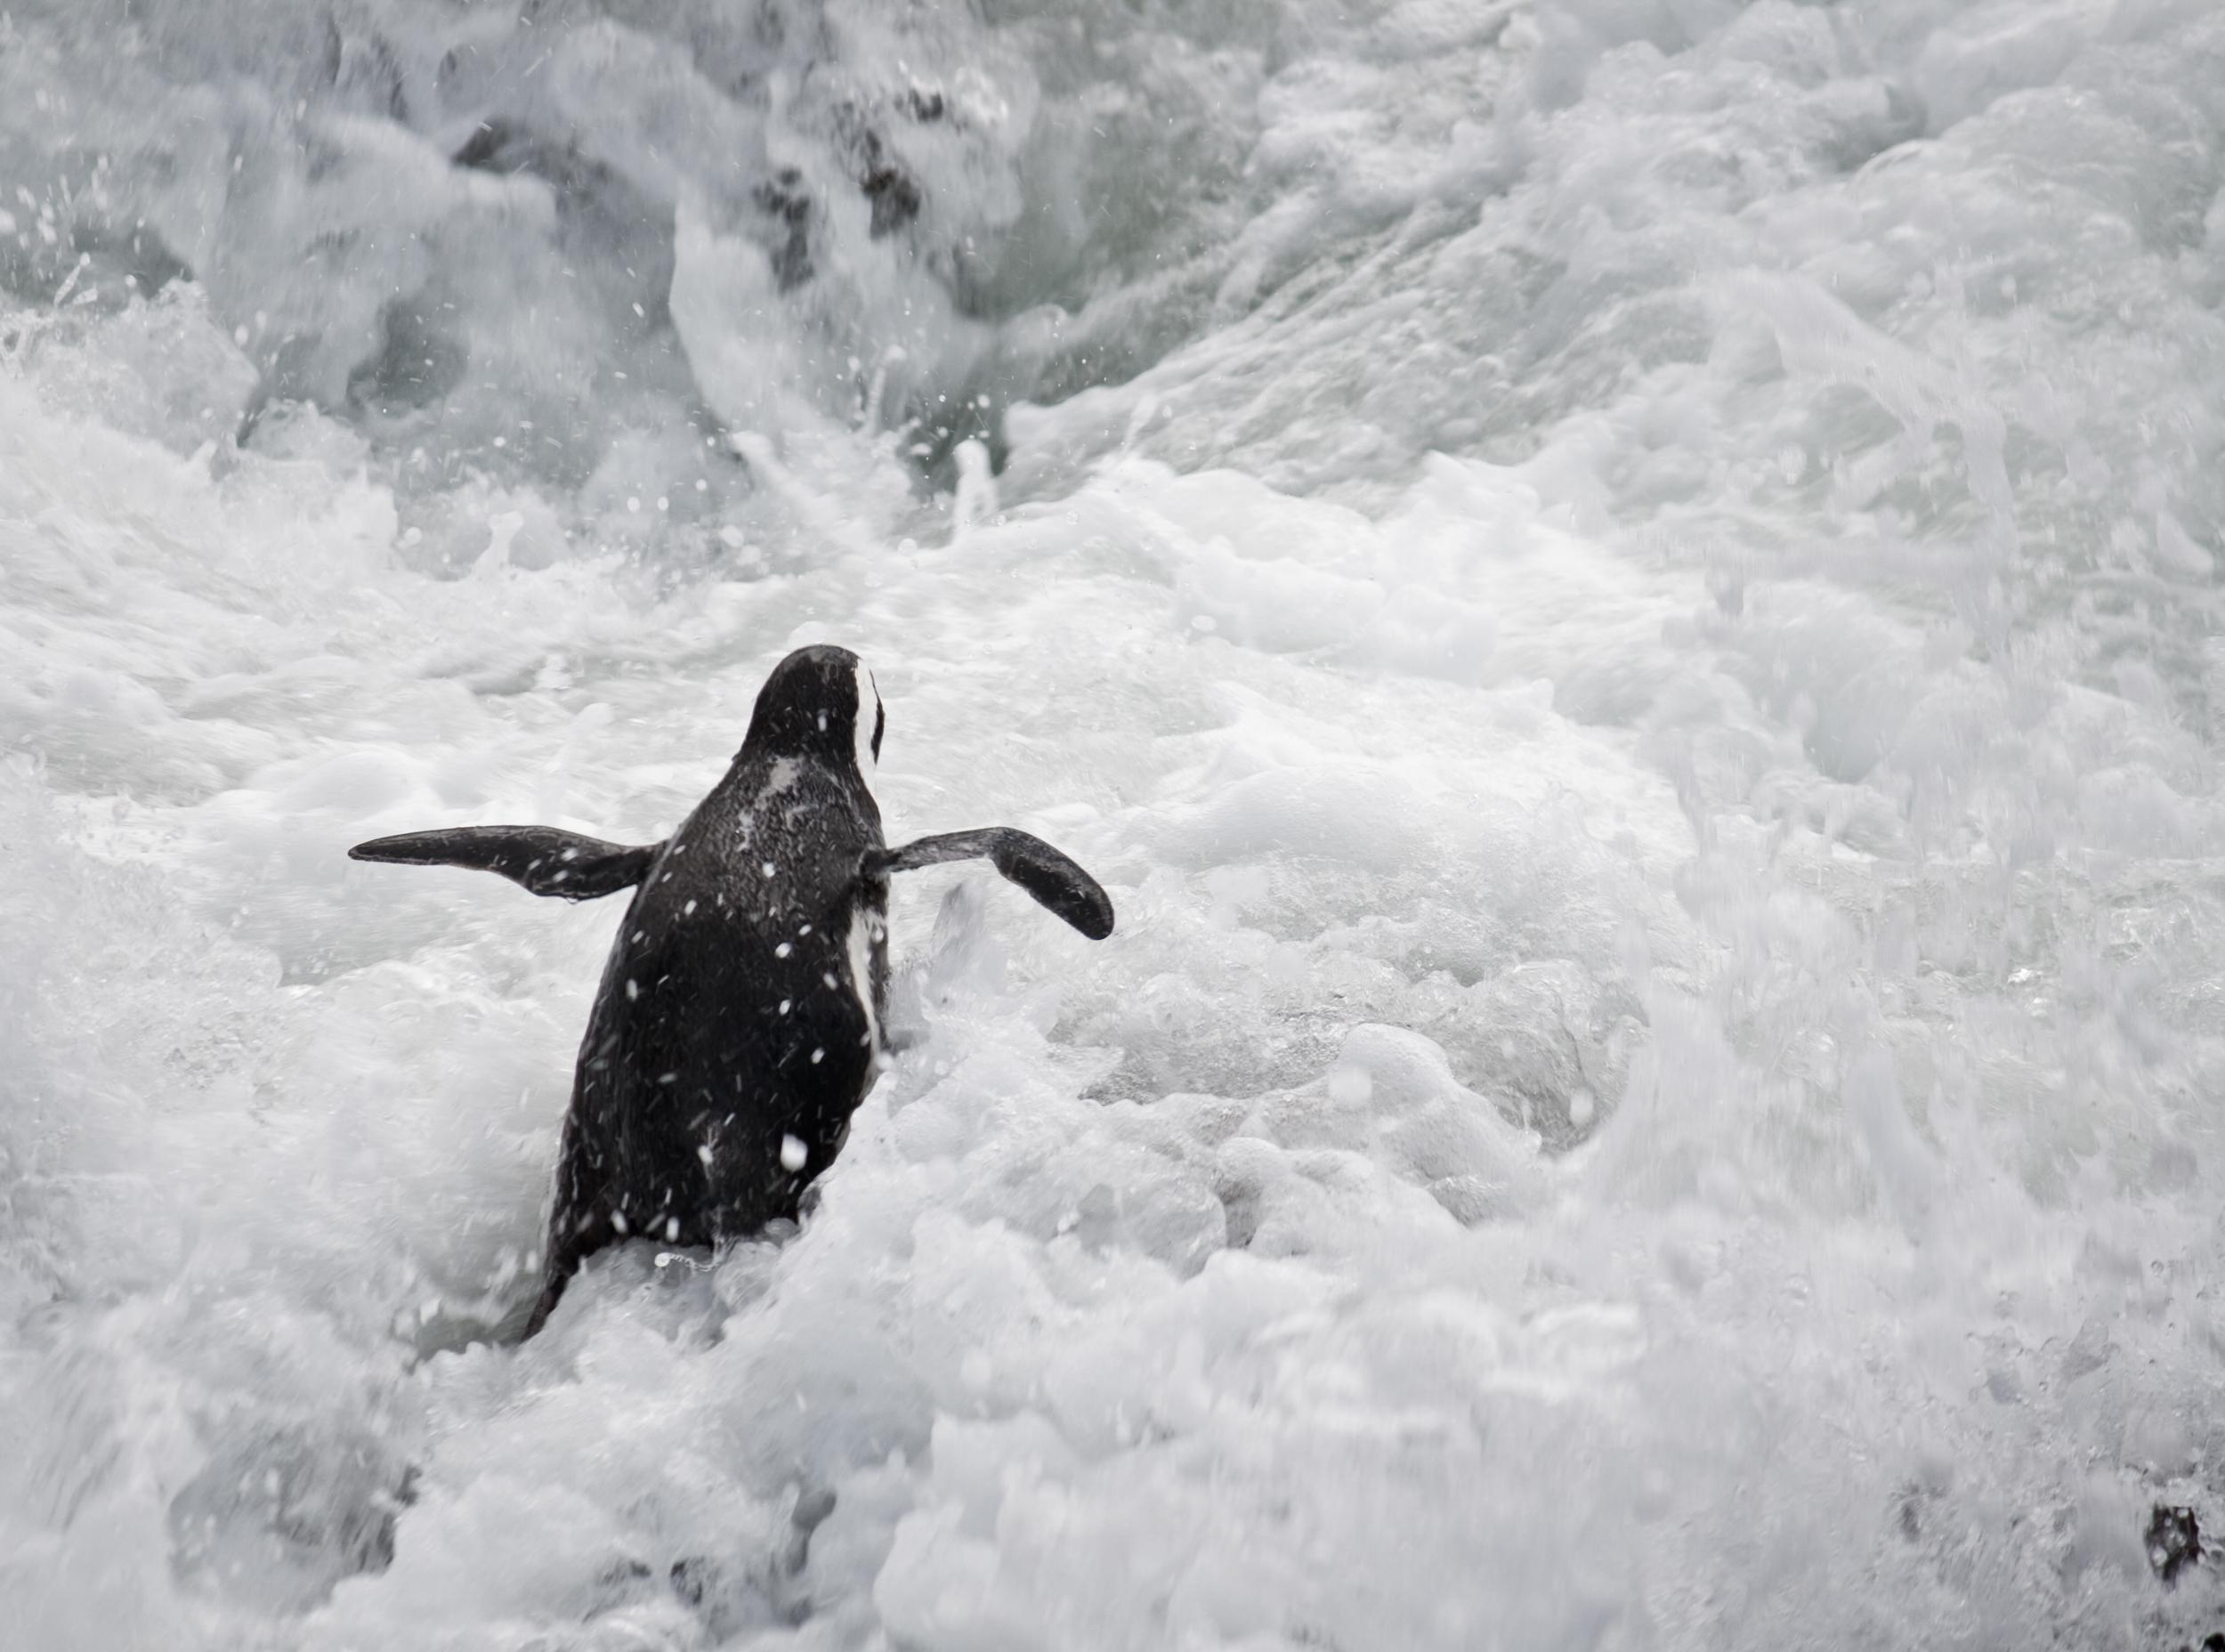 African Penguin by Bart Hiddink, zoutedrop on Flickr